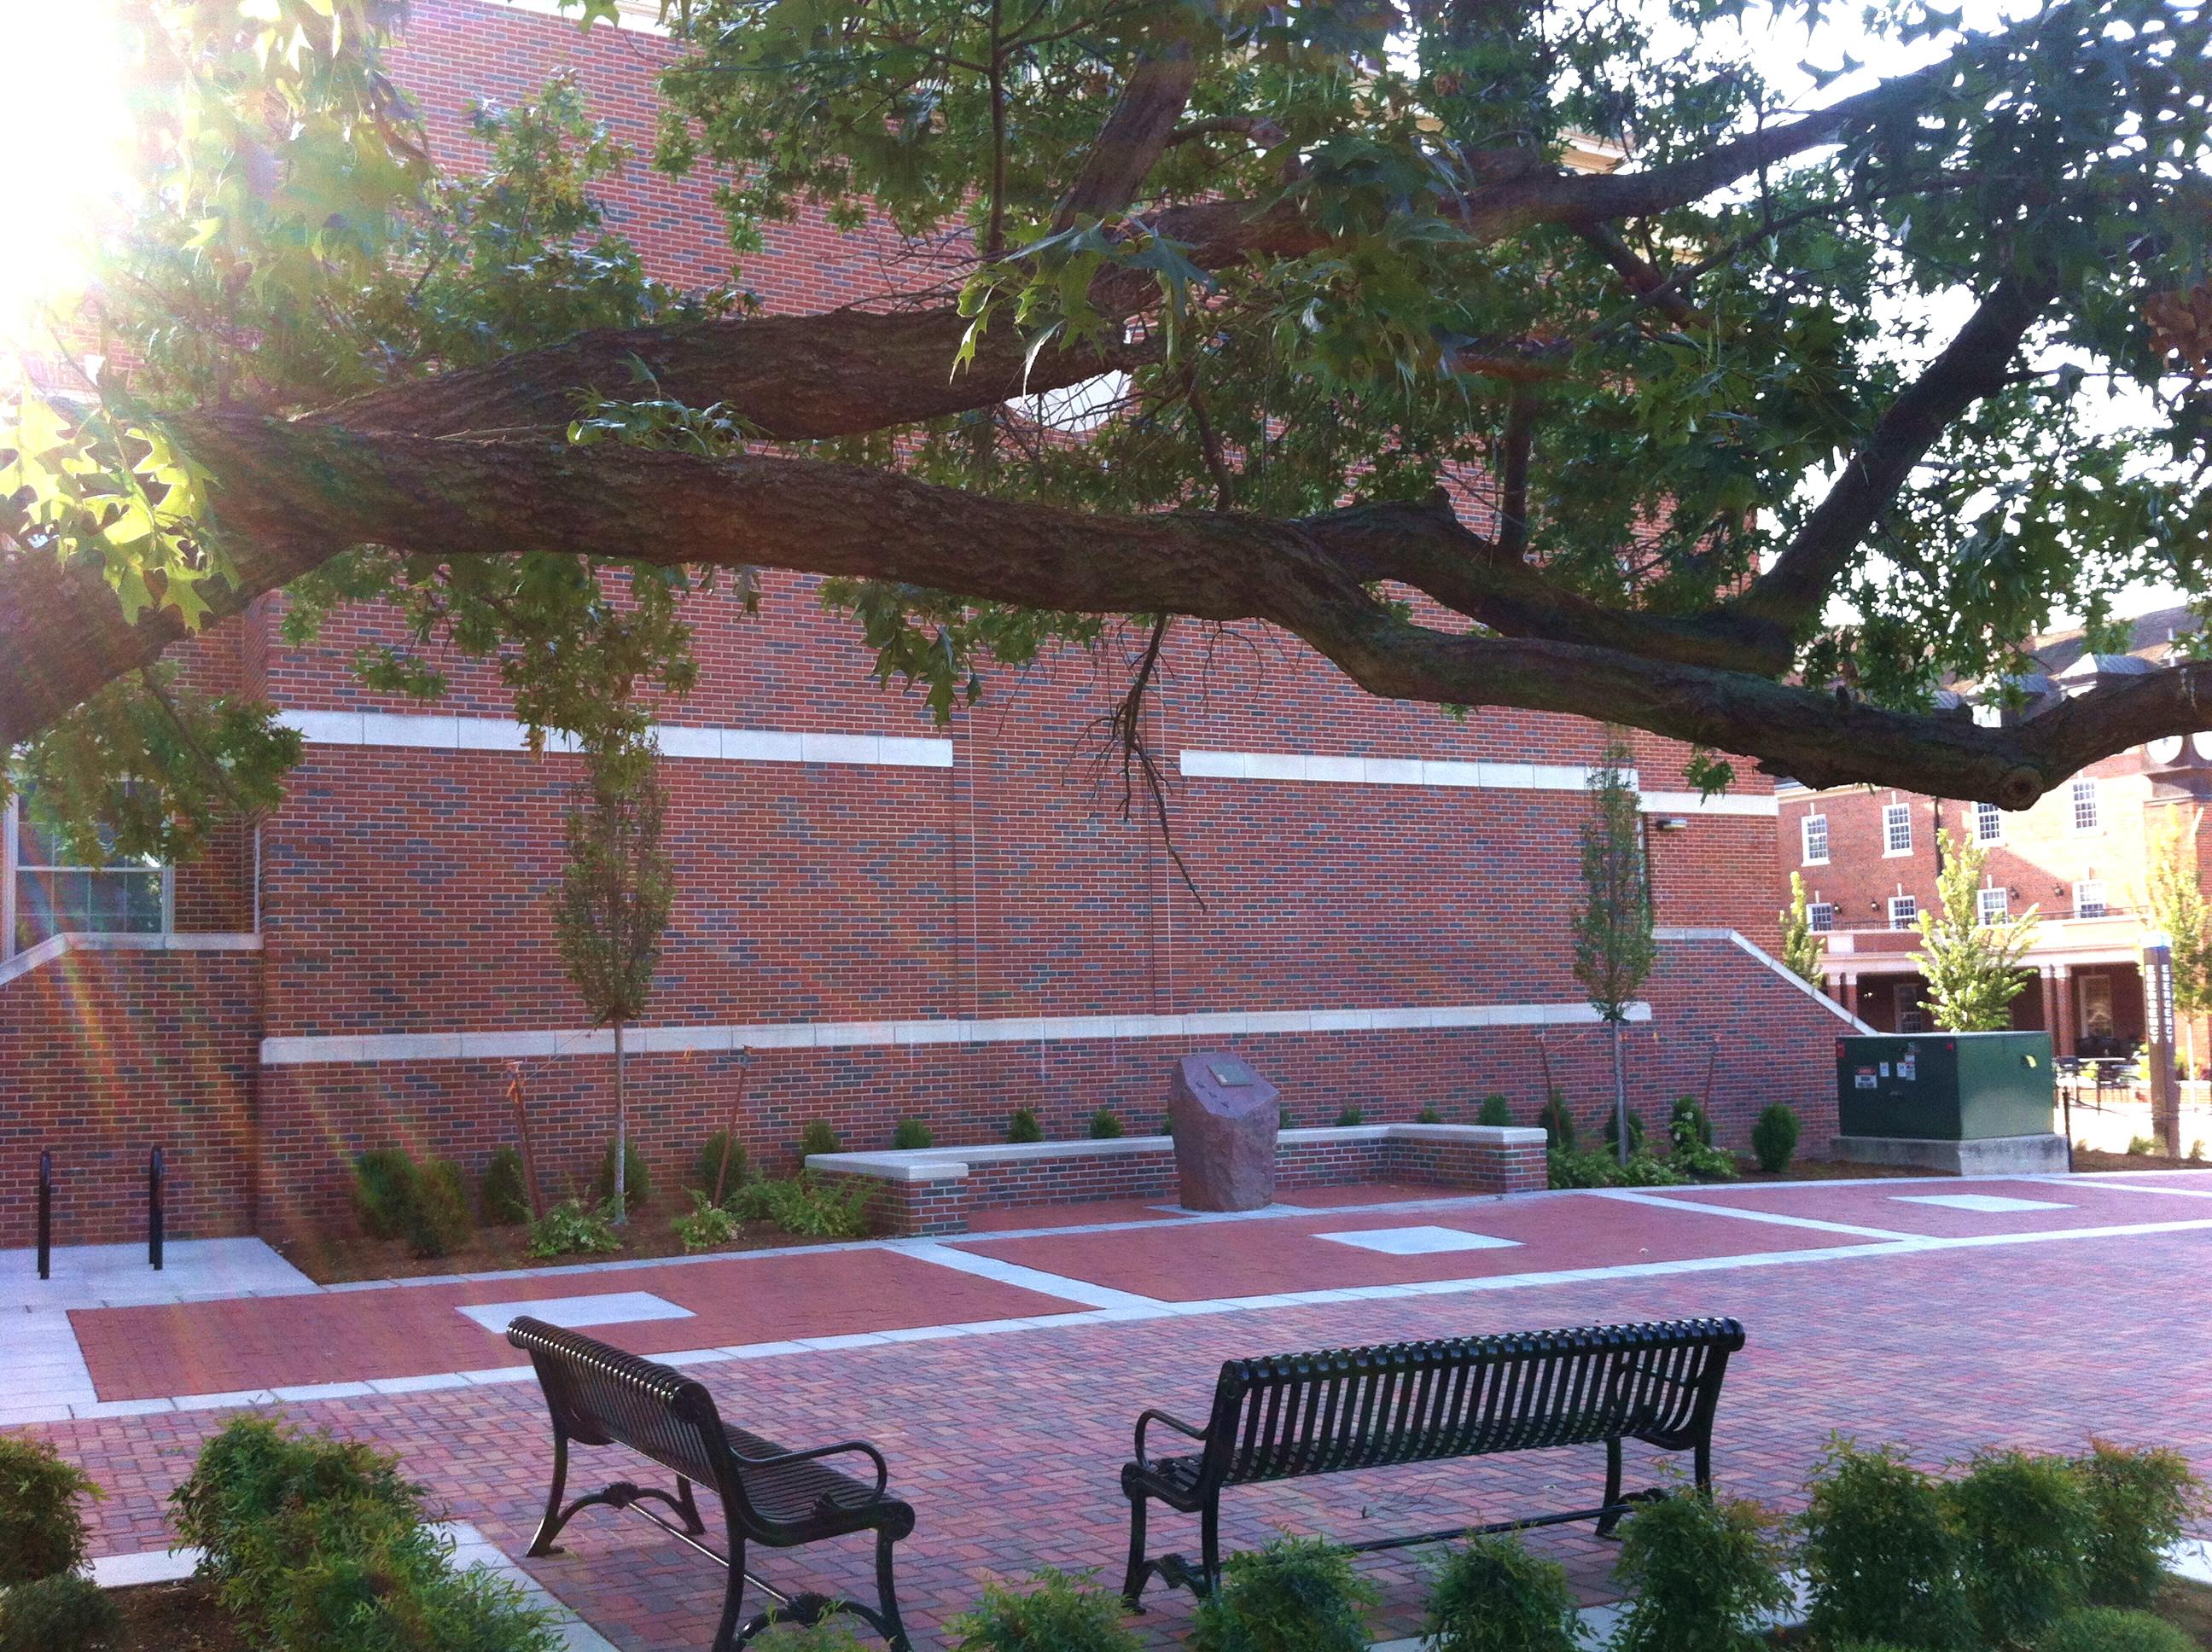 Kappa Kappa Psi Shrine's New Home and Surroundings on OSU's Campus